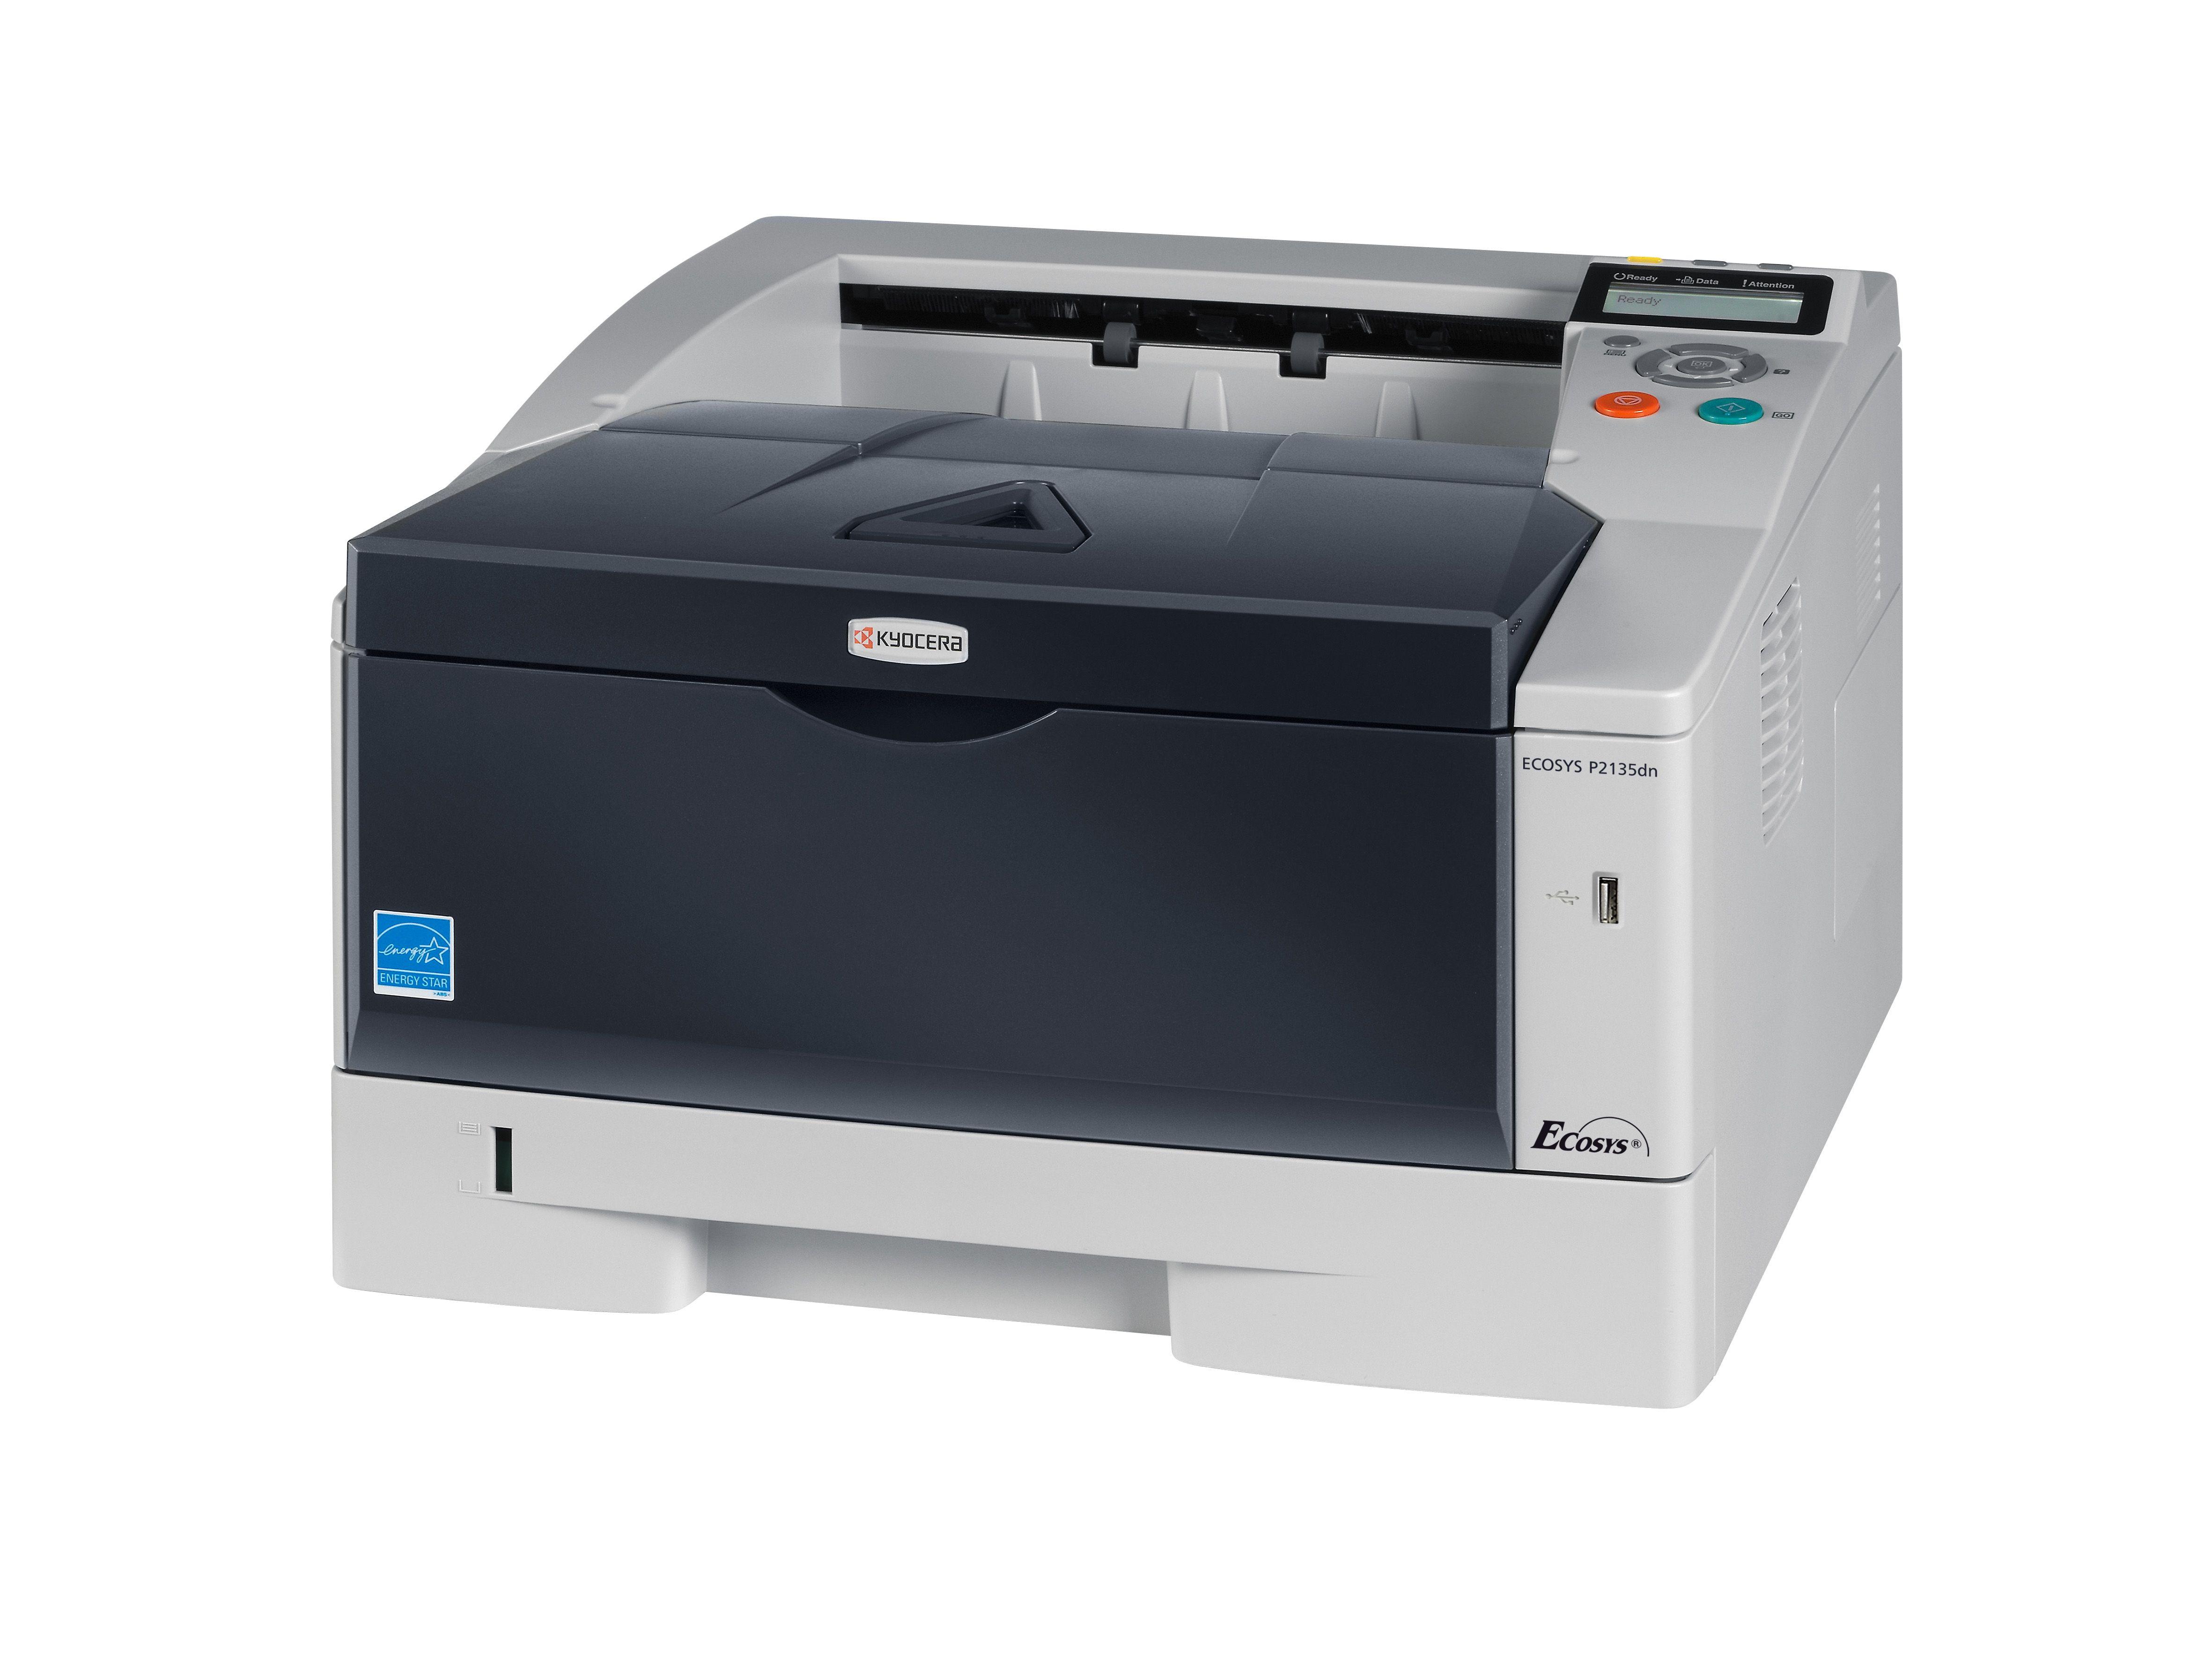 Kyocera Ecosys P2135dn Kl3 Epson Lq Ibm Proprinter Microsoft Xps Pcl 5c Pcl 6 Kyocera 8b62pjn1 Laserdrucker Hier Klic Laserdrucker Drucken New Classic